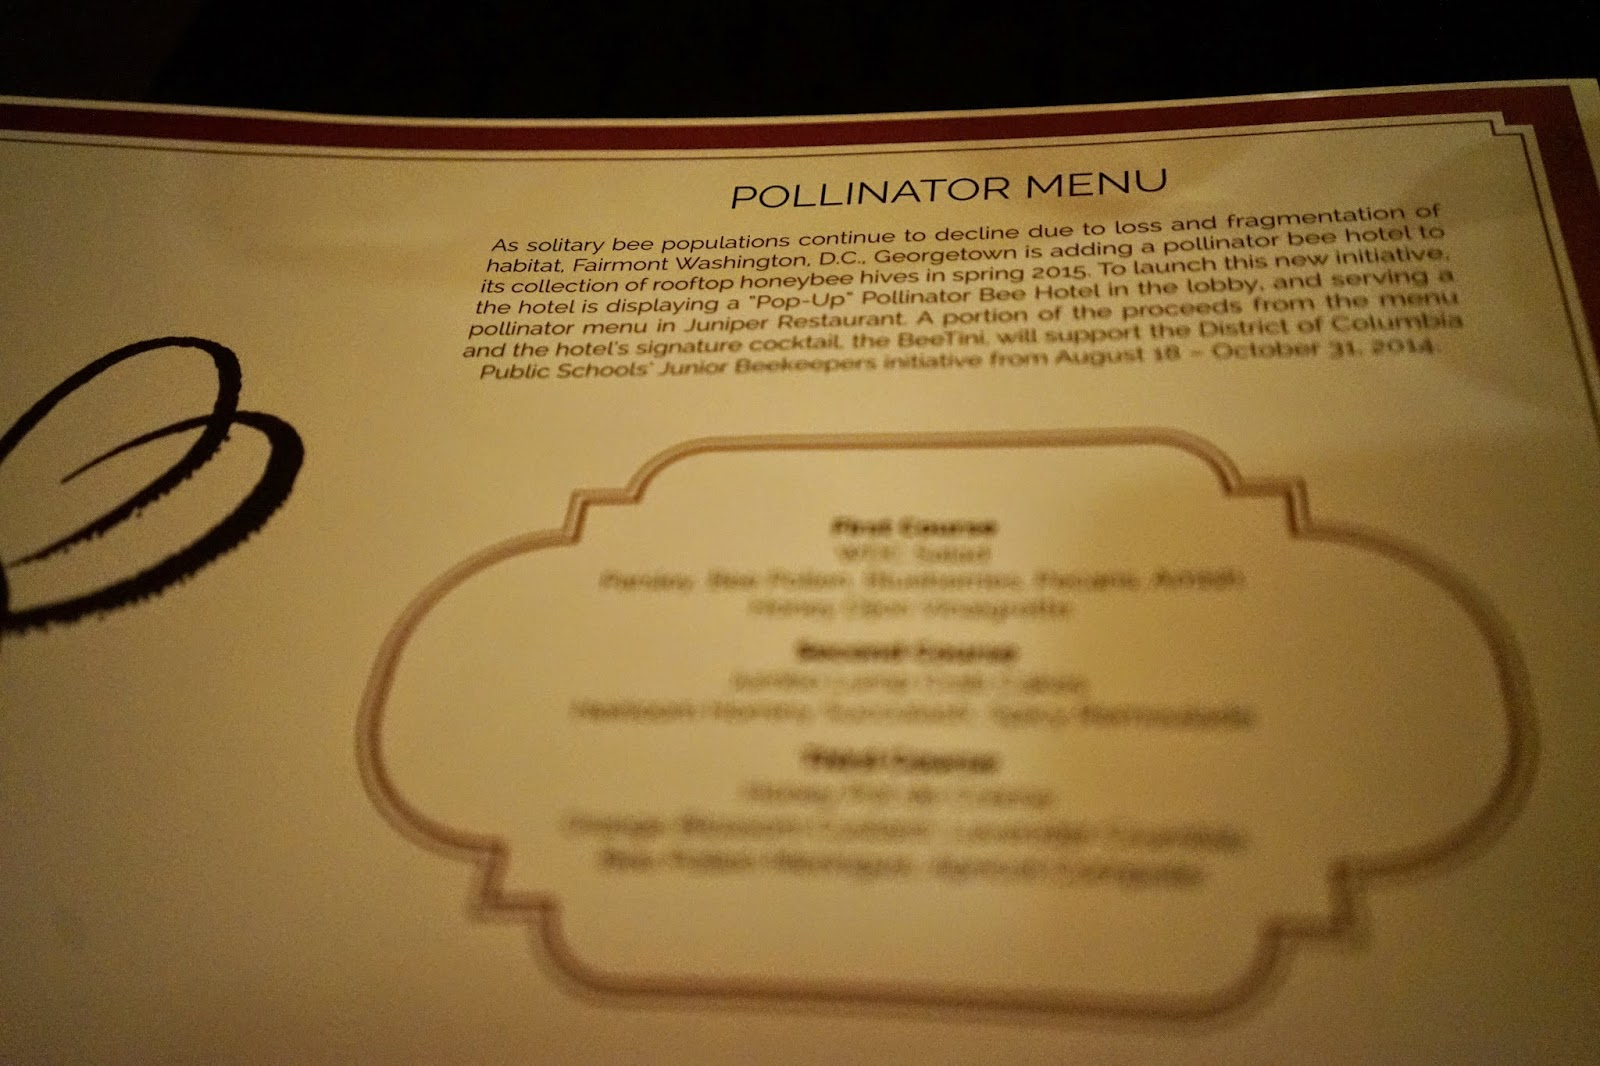 juniper restaurant washington d.c